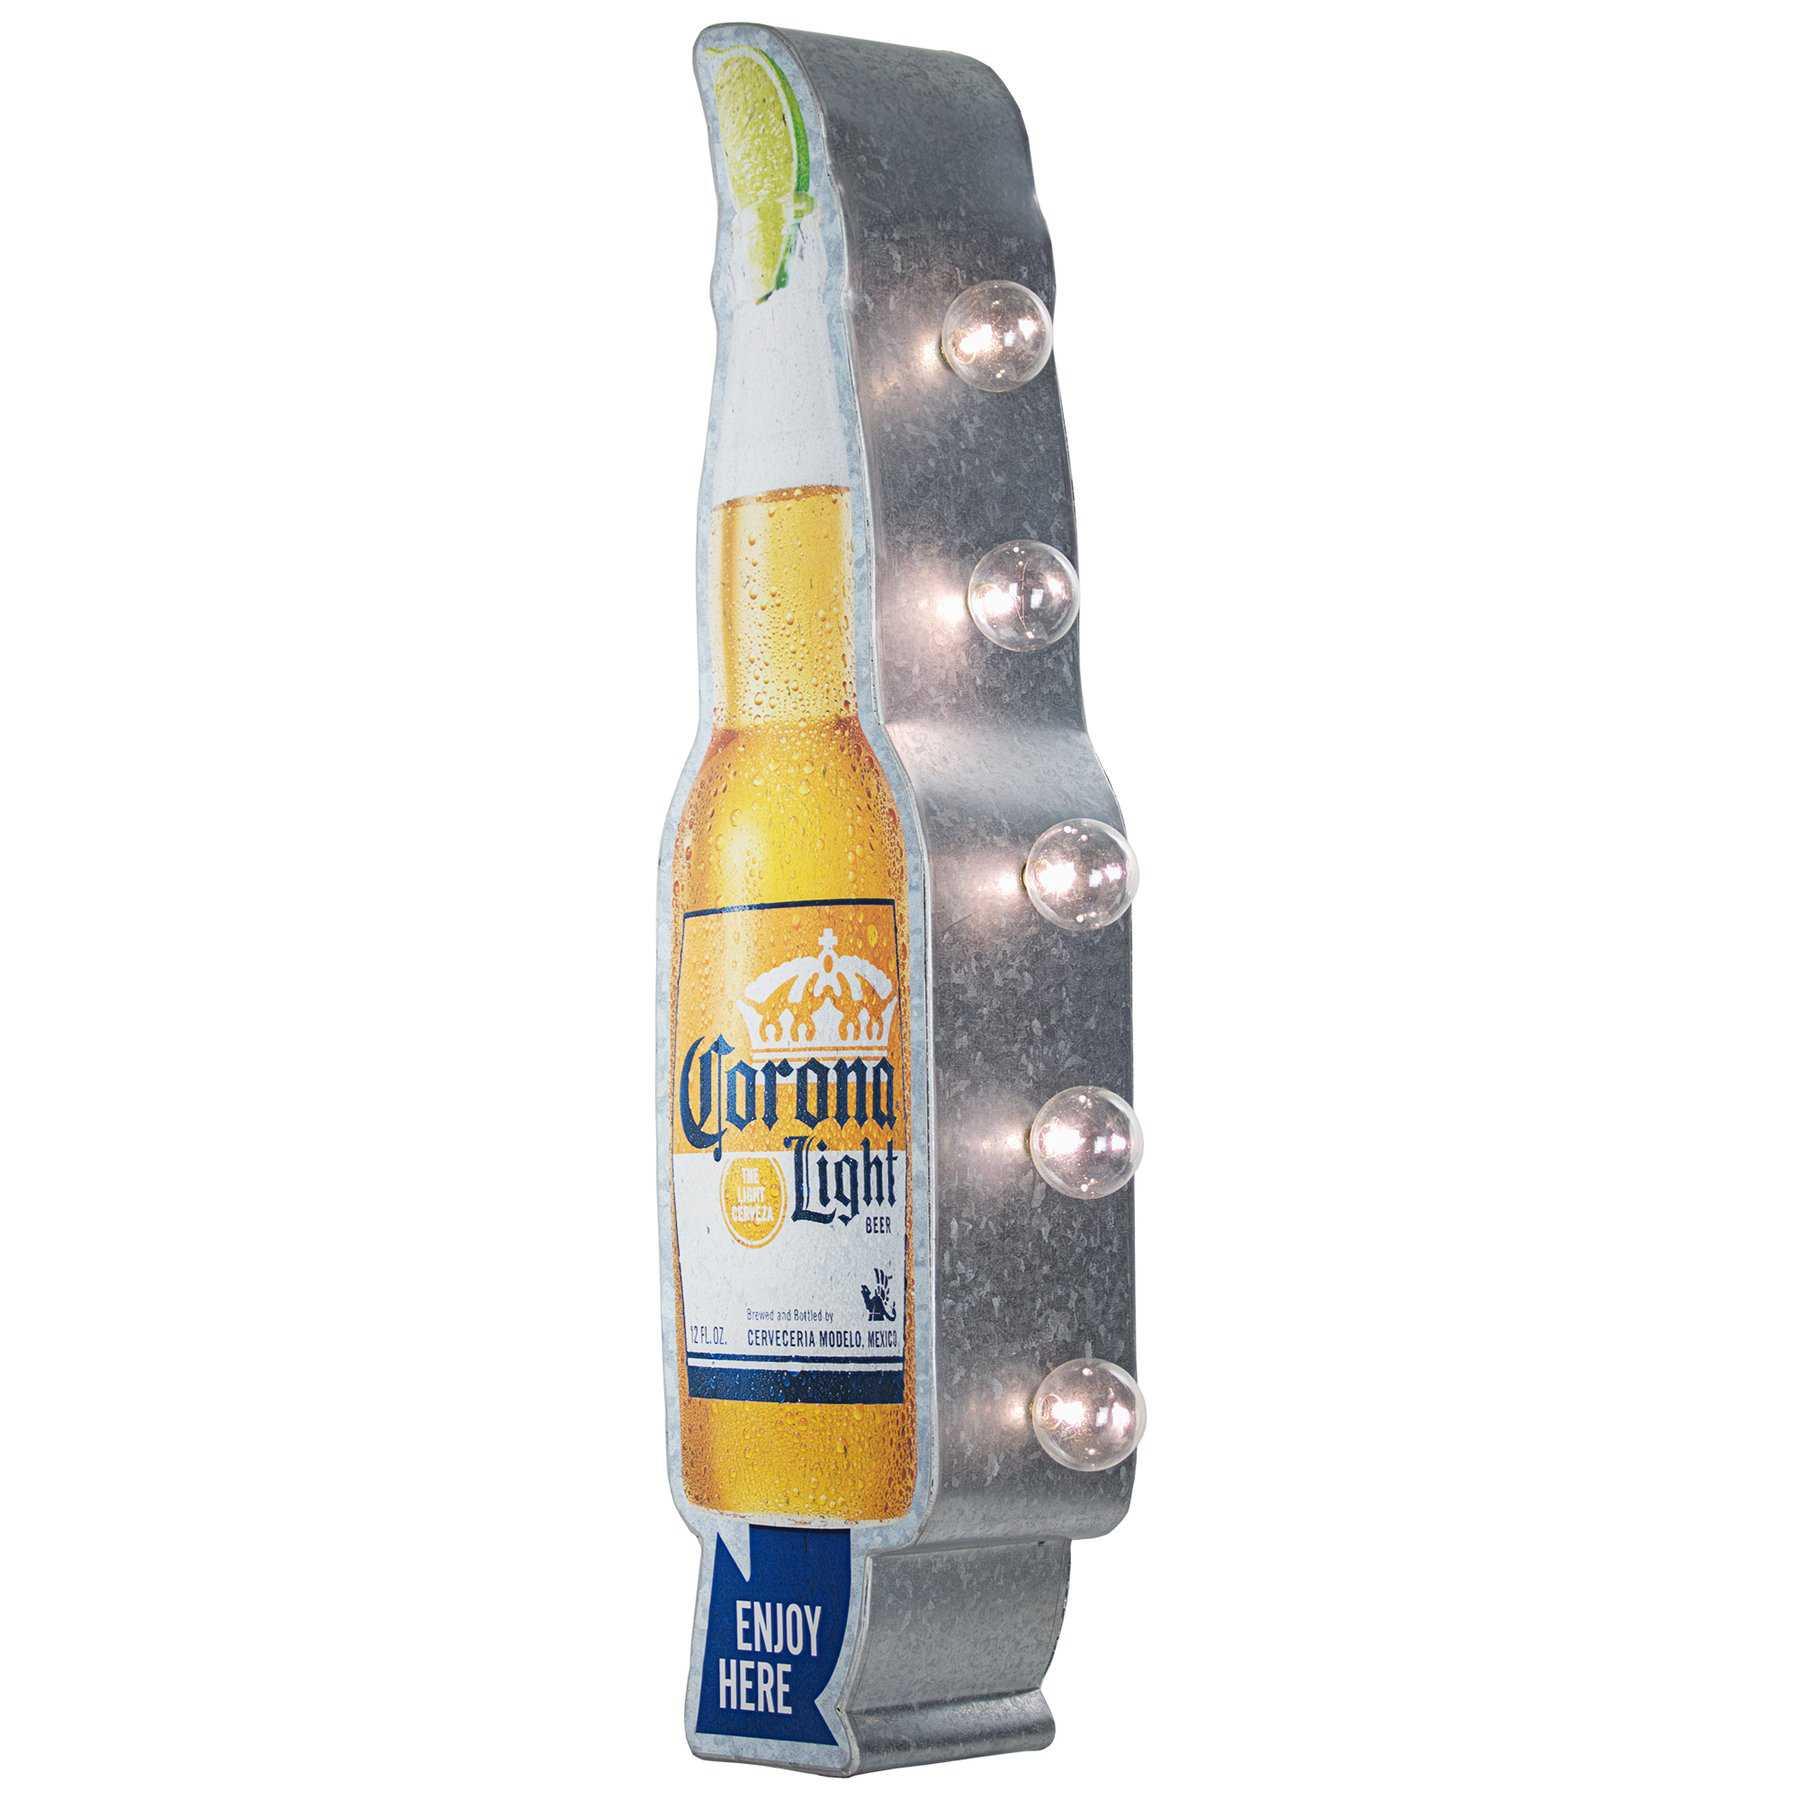 Vintage Two Sided Led Sign - Corona Light